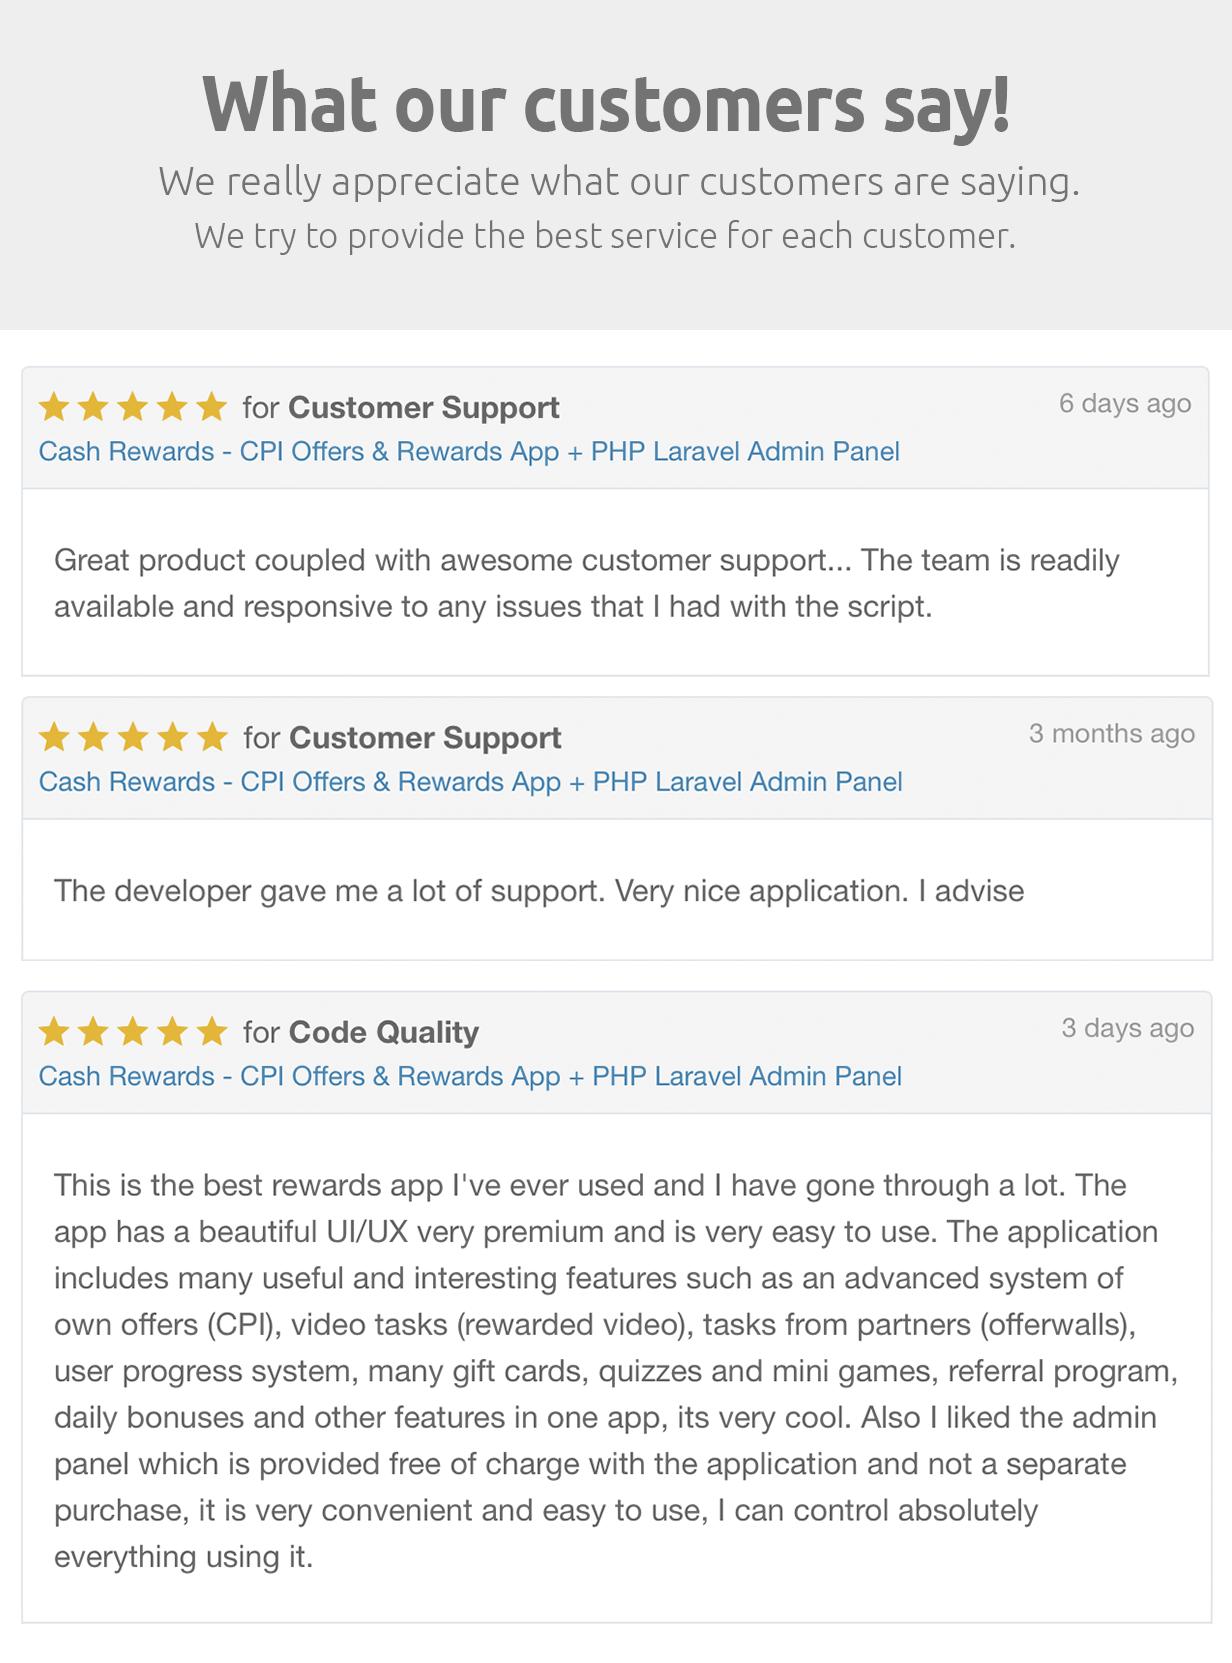 Premium Rewards App - CPI Offers System & Rewards App & HTML5 Mini Games + PHP Laravel Admin Panel - 16